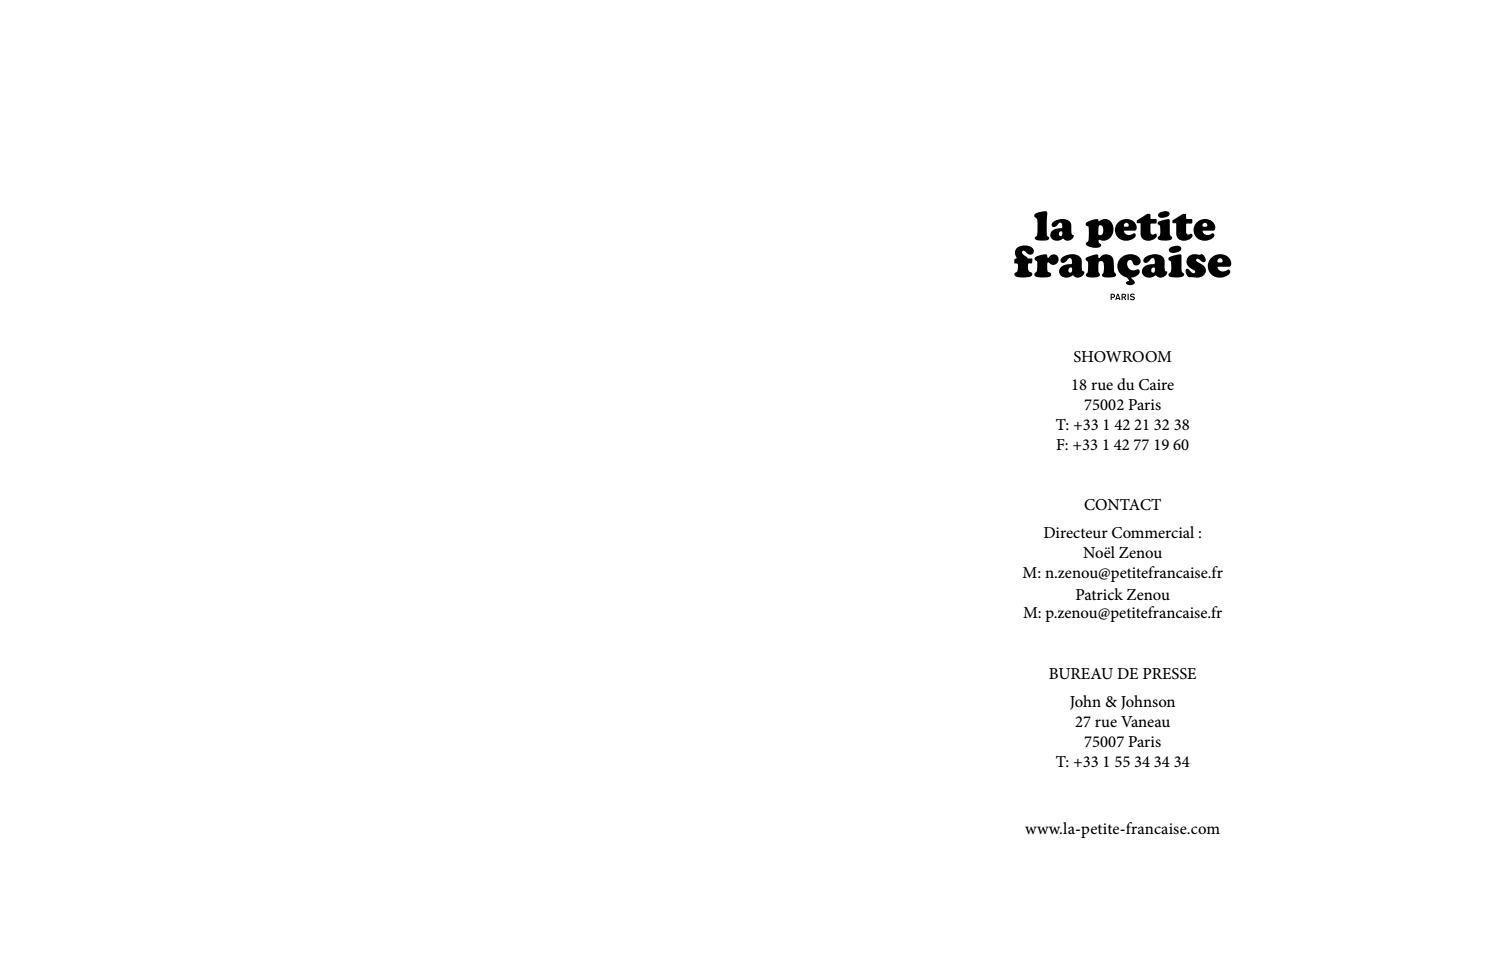 43f2ad46459 La petite française ss17 lookbook by Marlies - issuu